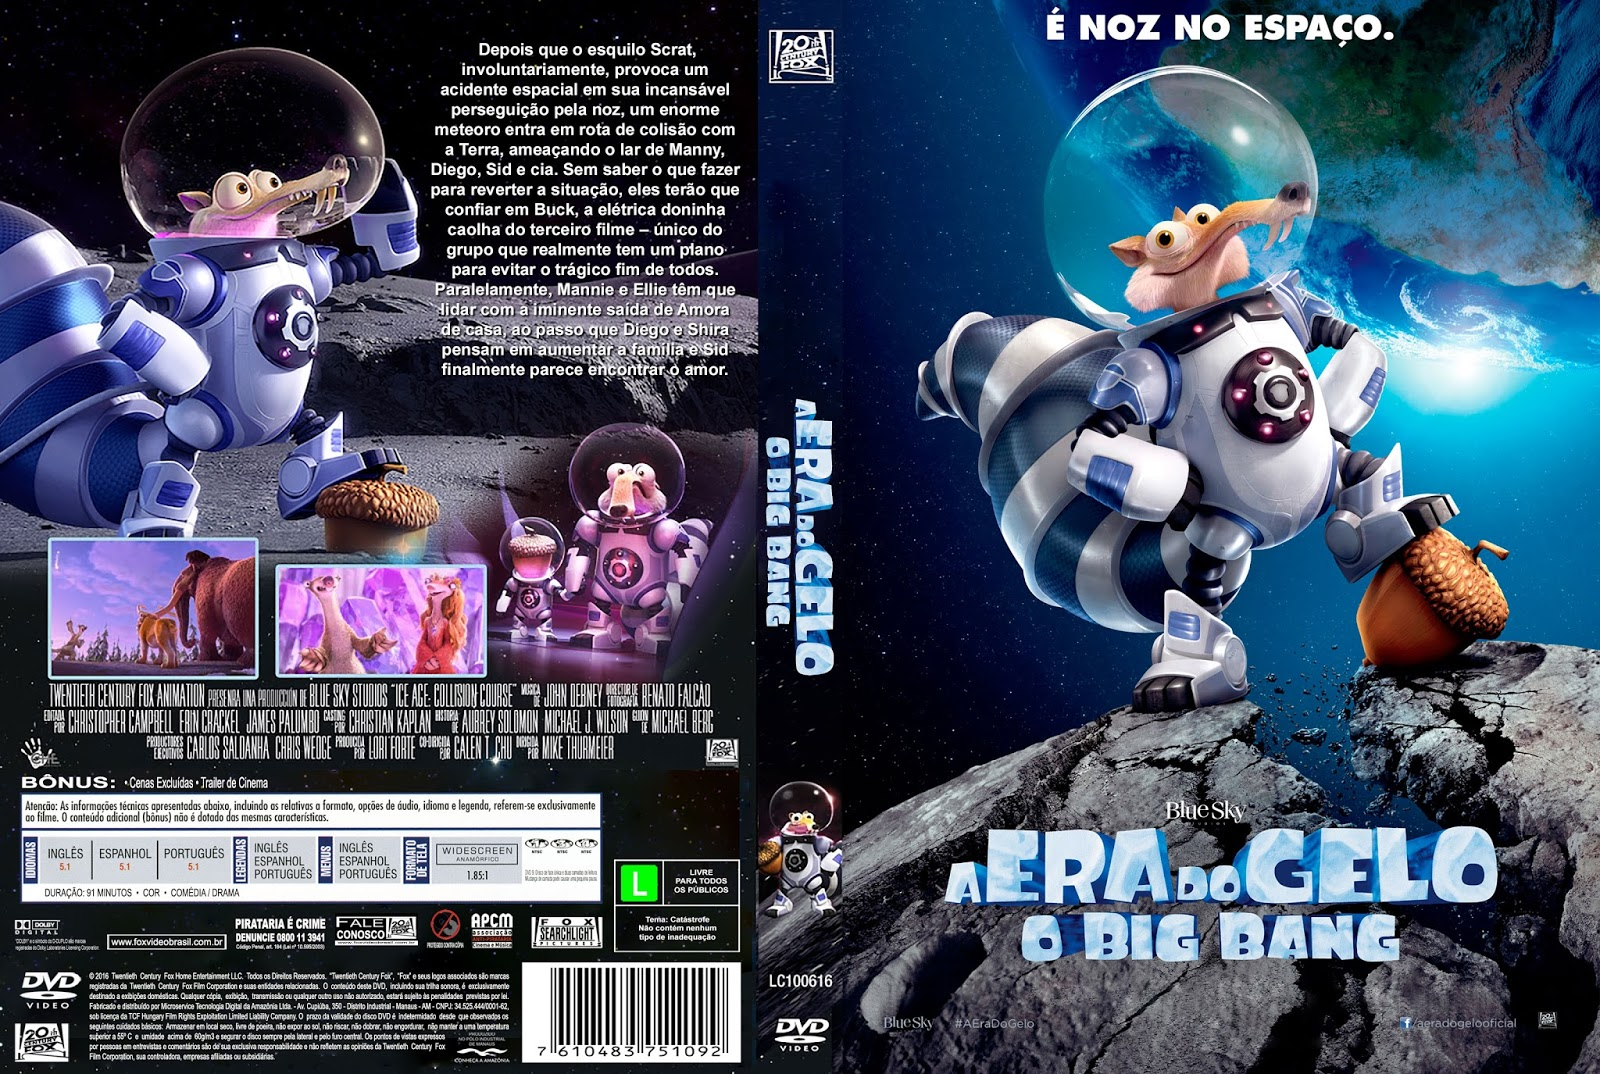 Download A Era do Gelo O Big Bang DVD-R A 2BEra 2Bdo 2BGelo 2B  2BXANDAODOWNLOAD